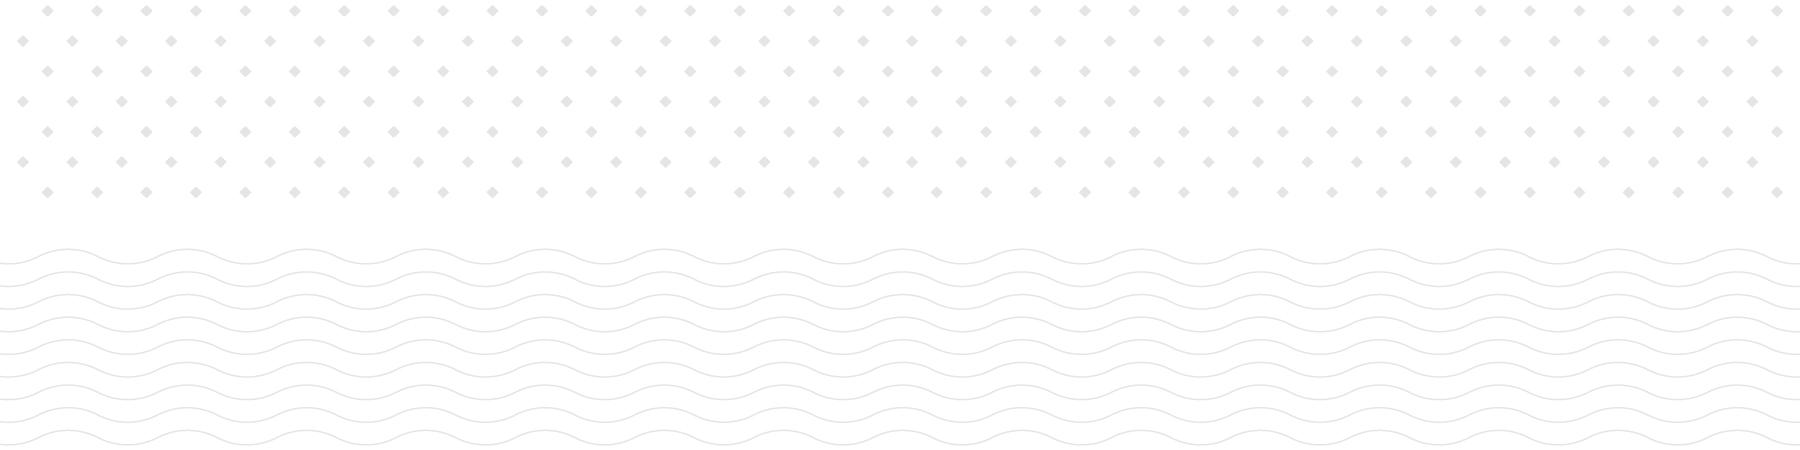 ShadeSuits-Pattern.jpg